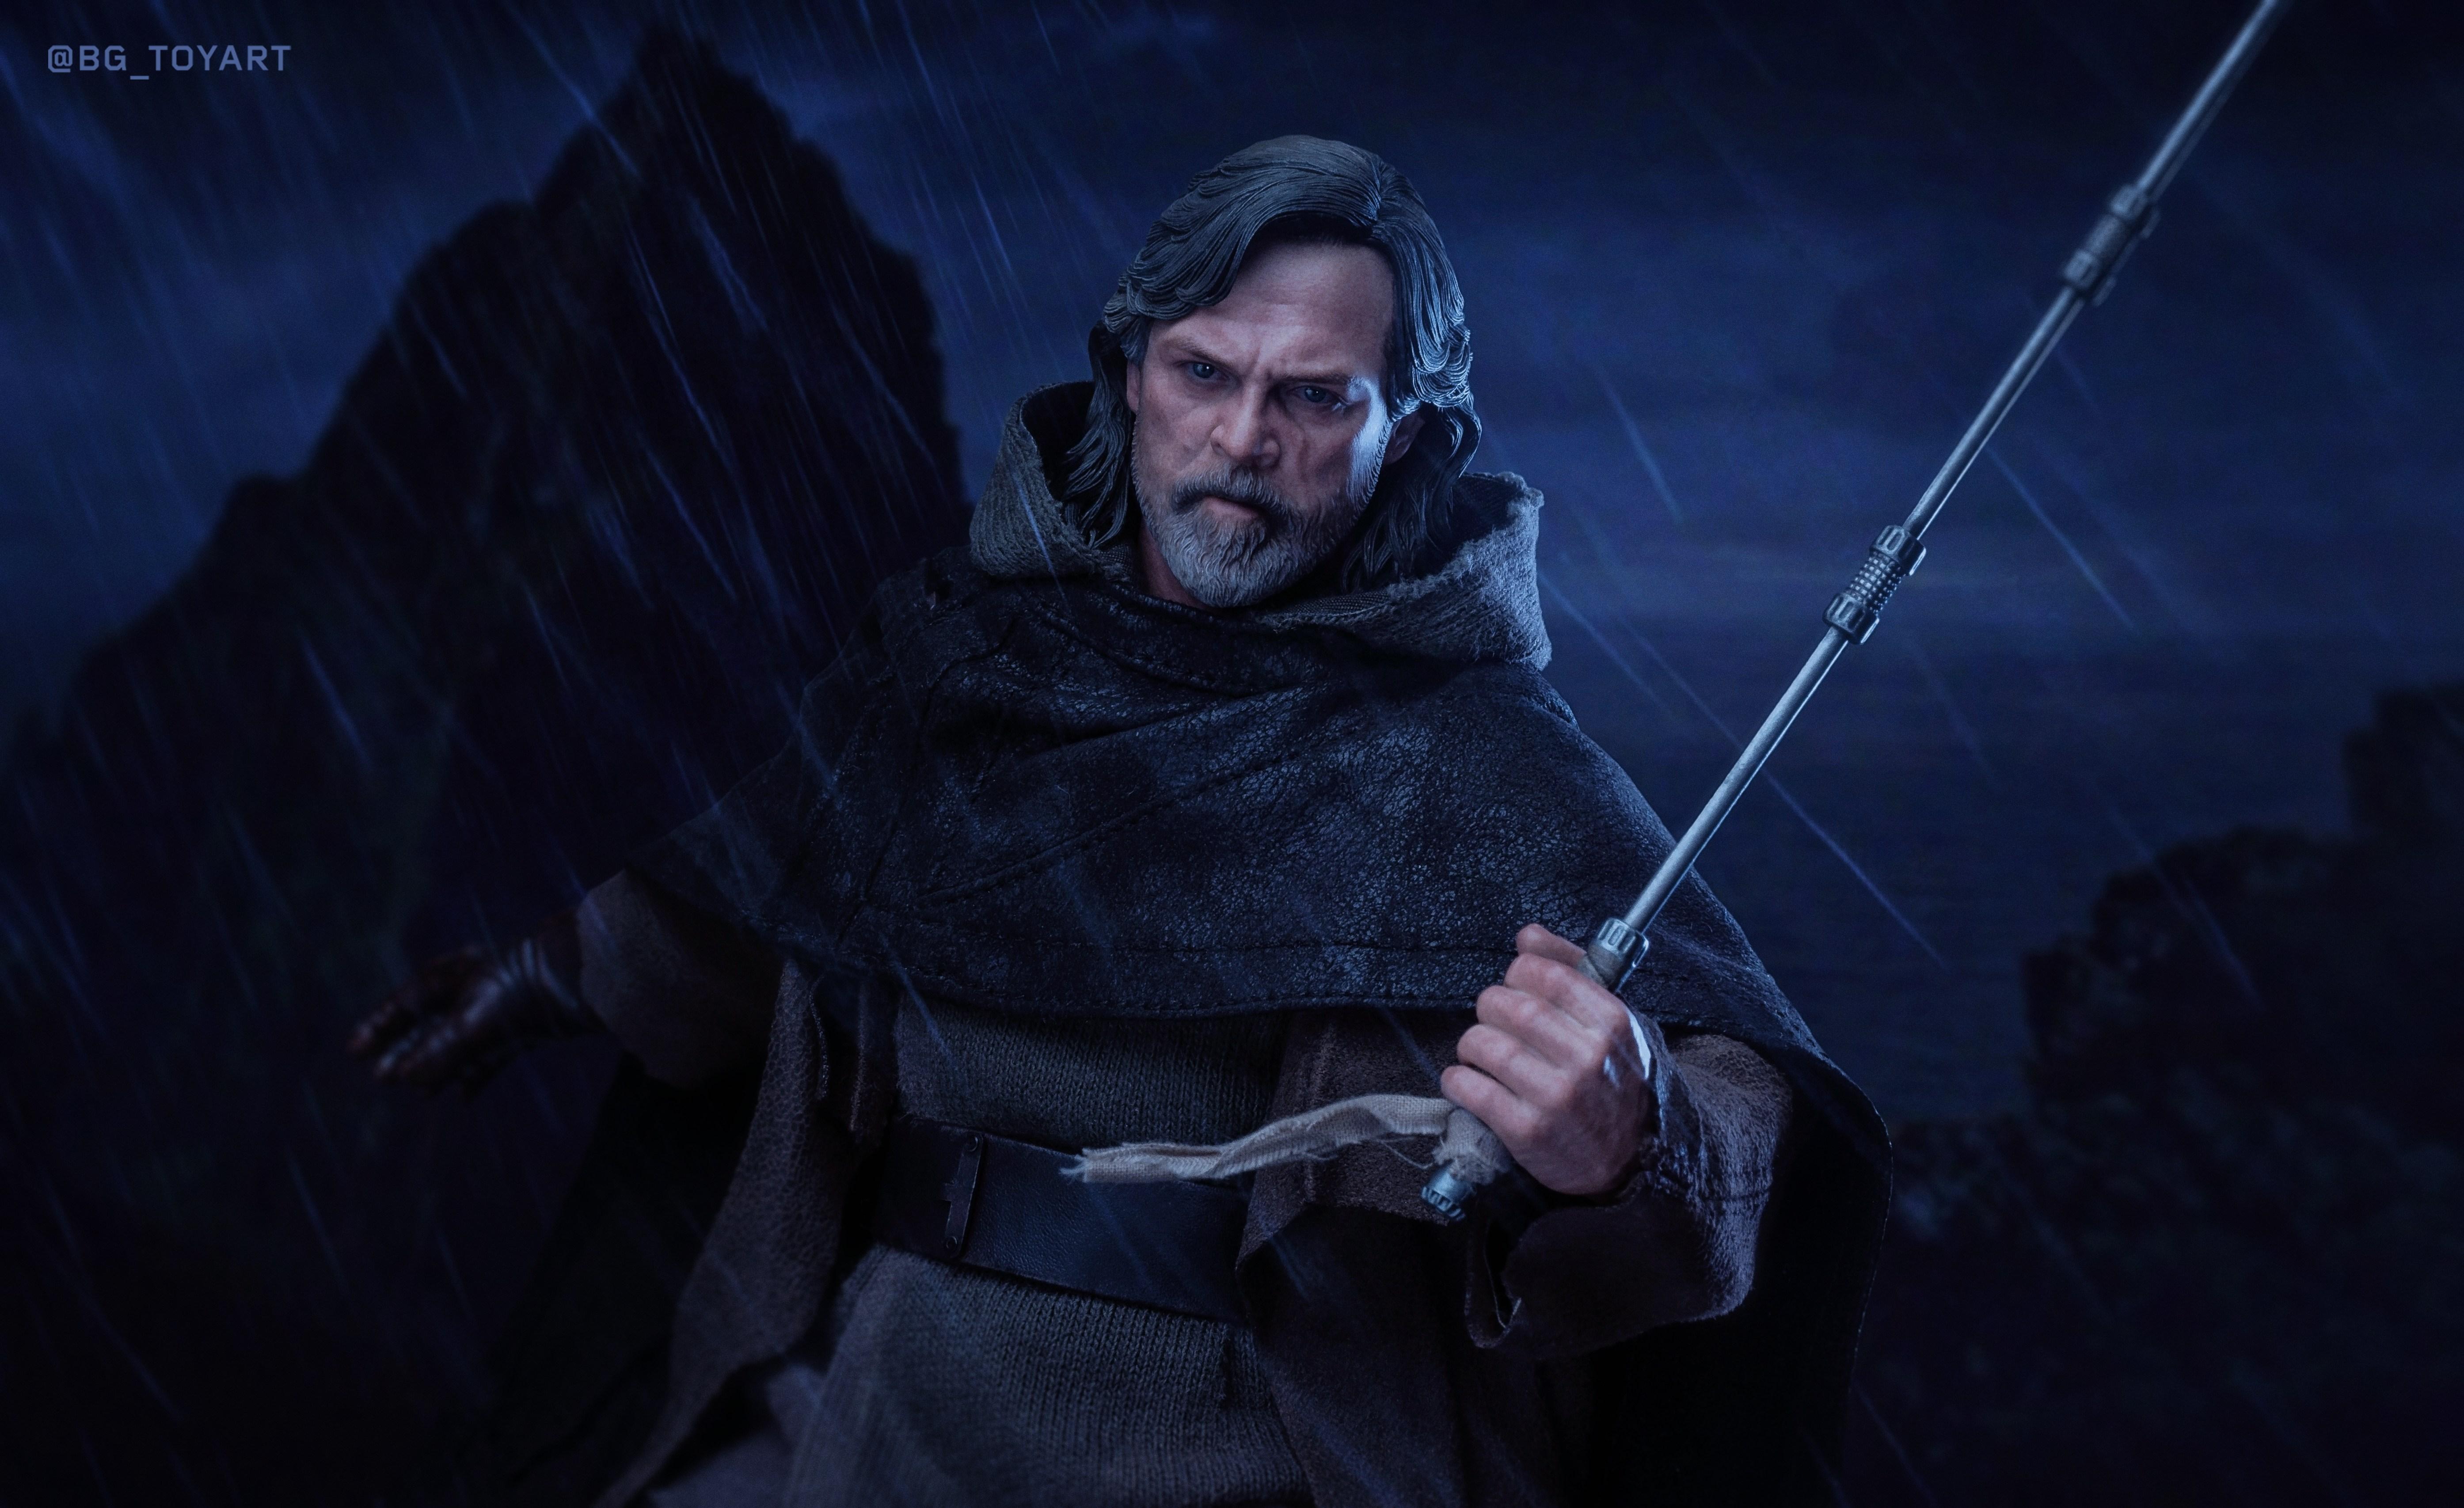 Master Luke Skywalker 5k Hd Movies 4k Wallpapers Images